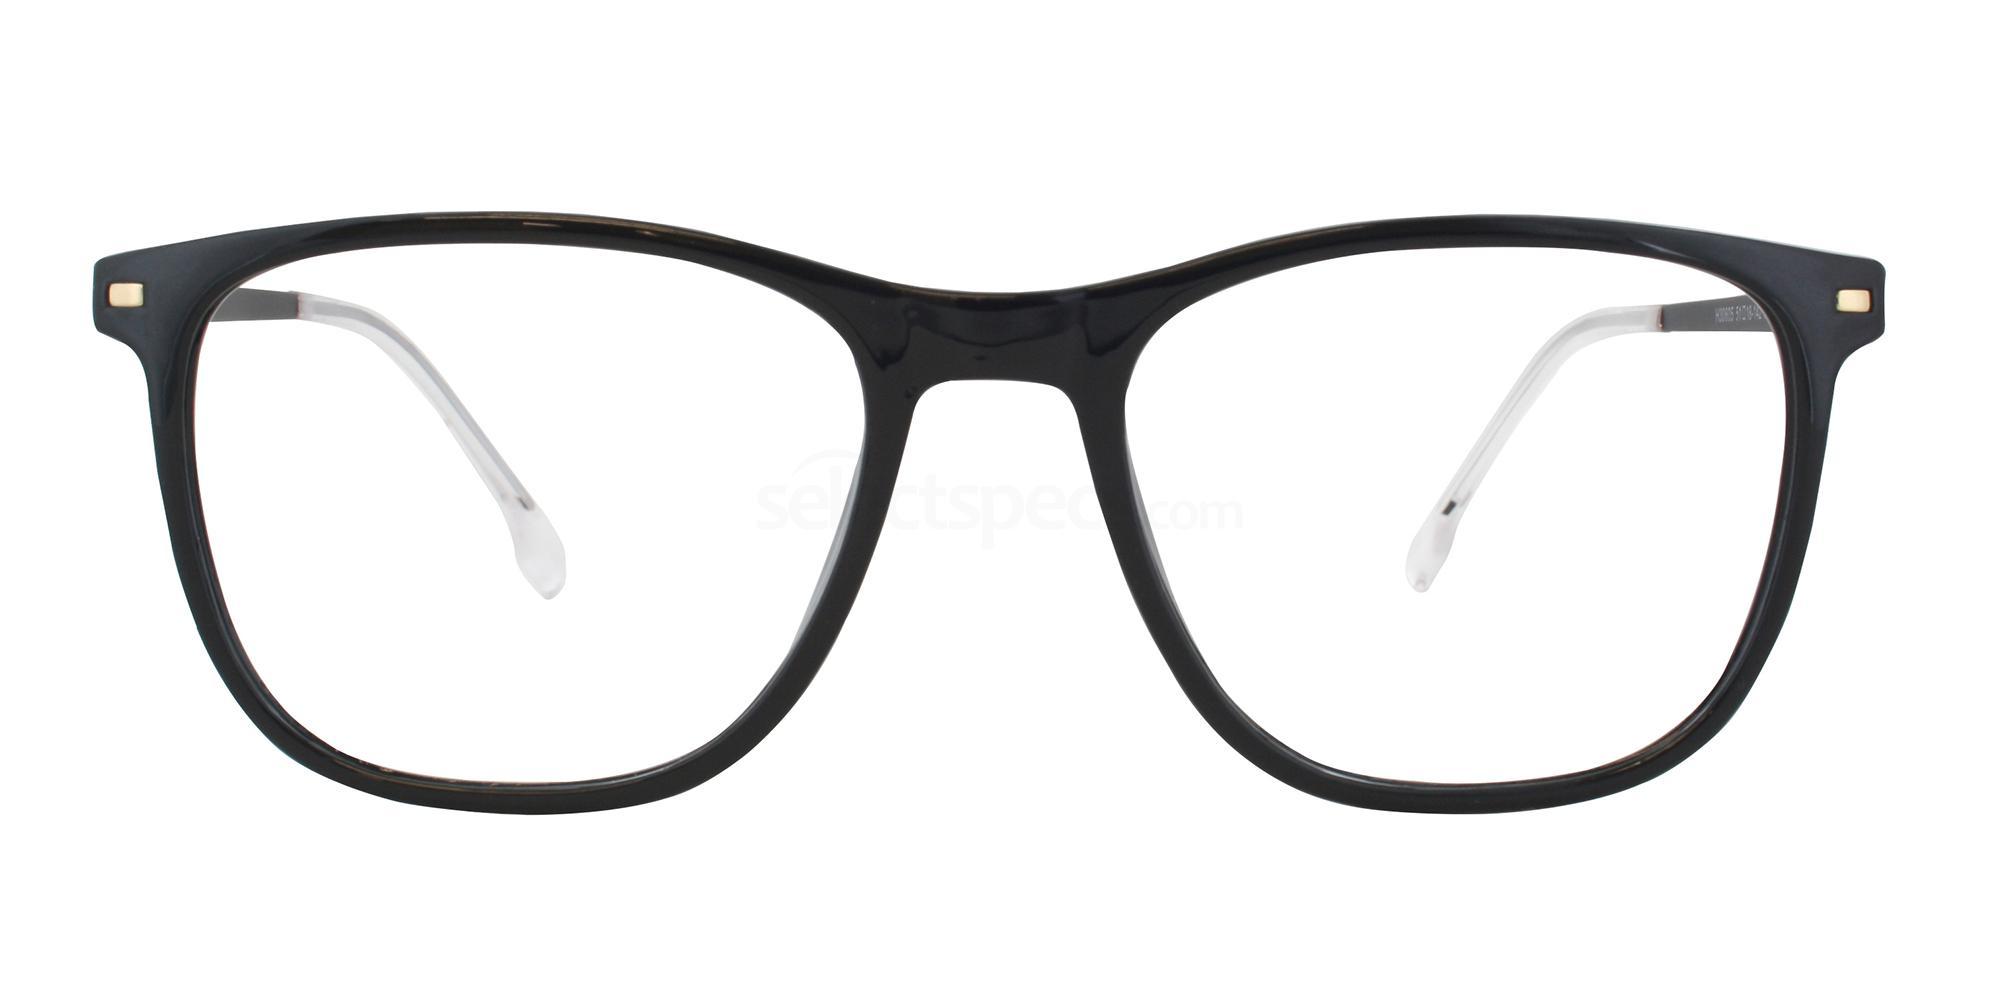 C1 H30605 Glasses, Infinity